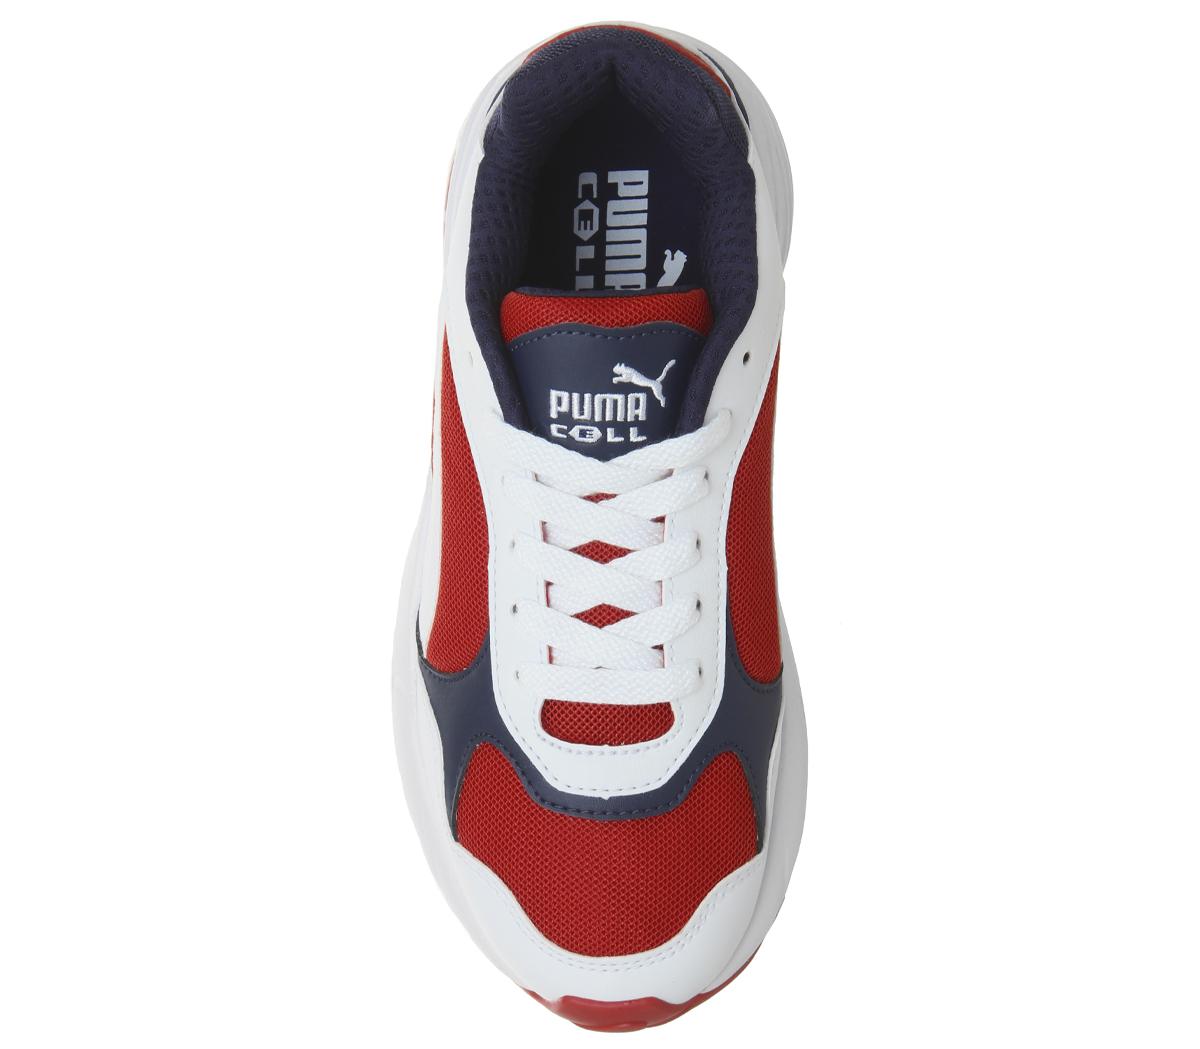 Homme-Puma-Cell-Viper-Baskets-PUMA-blanc-Risque-Eleve-Rouge-Baskets miniature 8